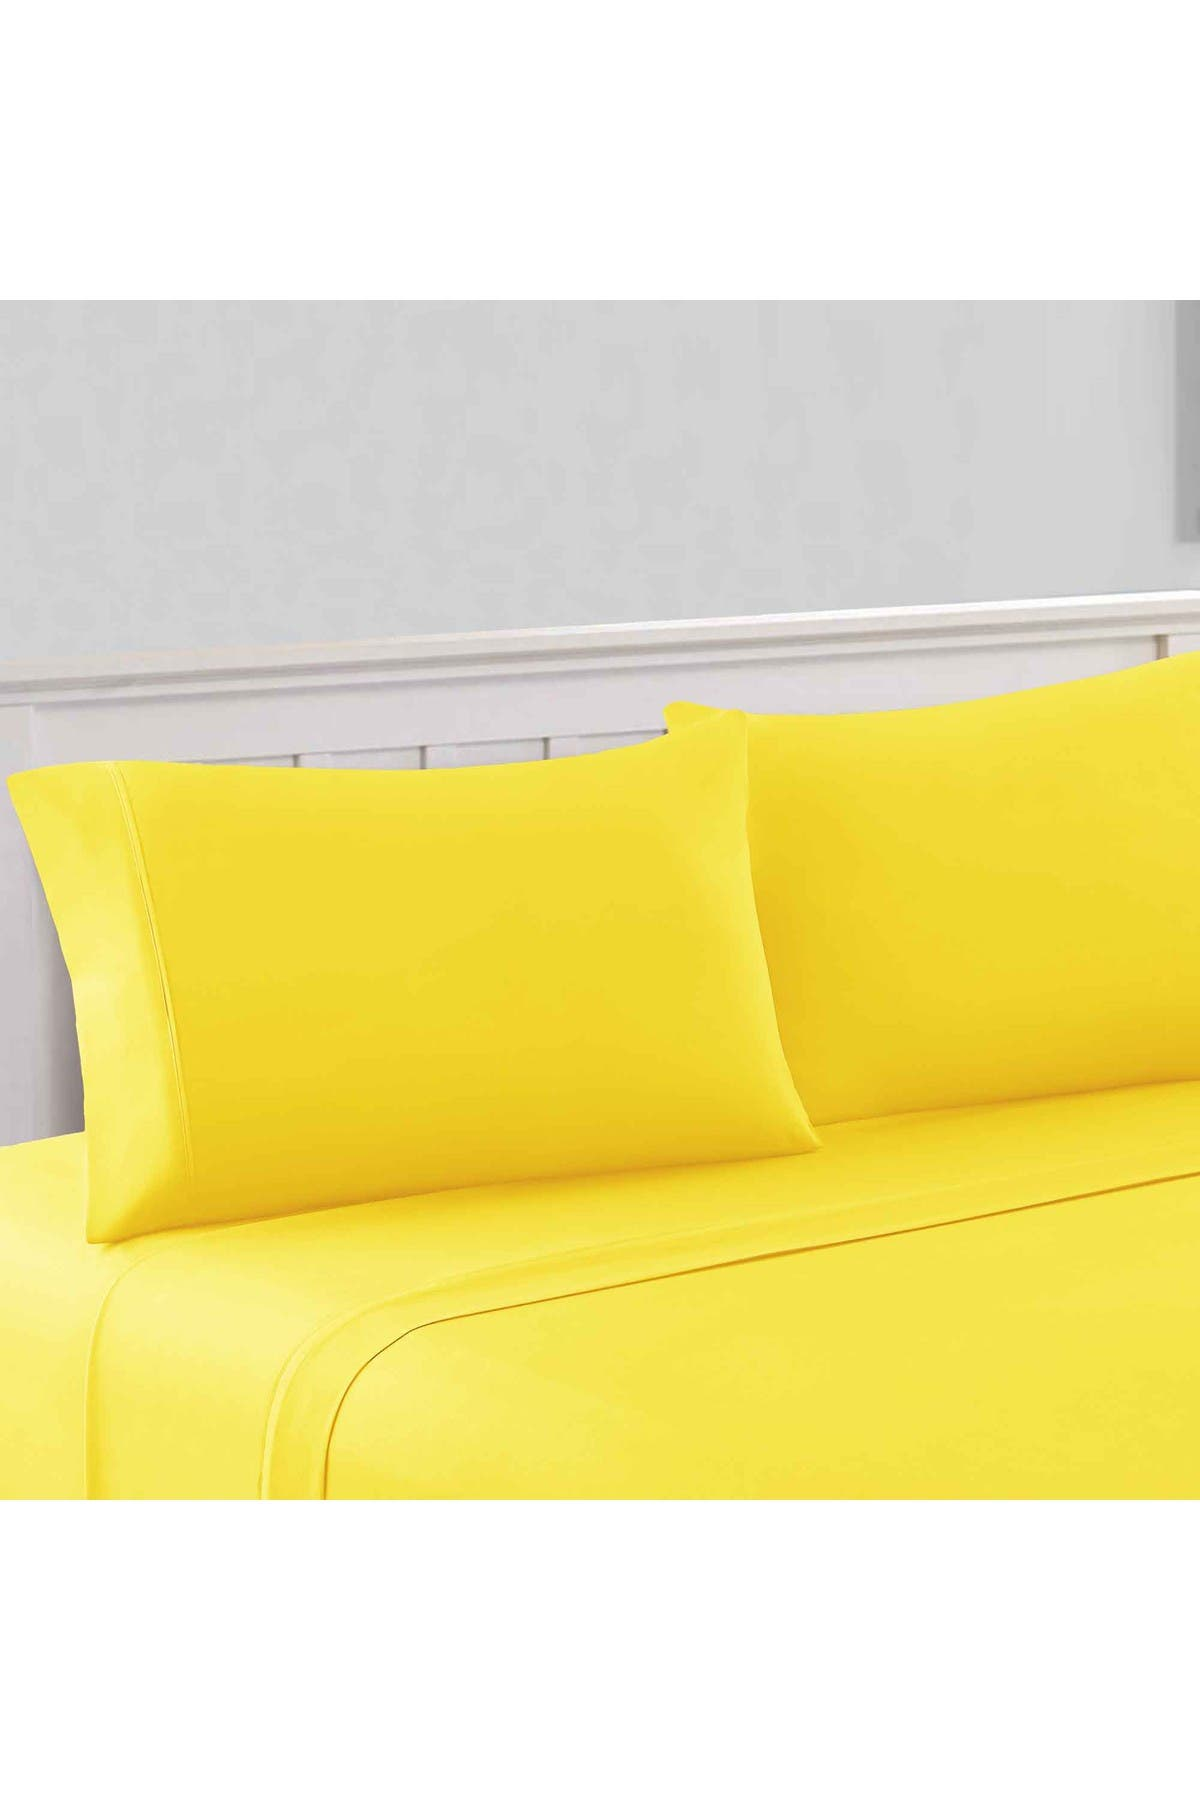 Image of Modern Threads 1800 Series 100 Solid Microfiber 4-Piece Sheet Set Yellow Queen